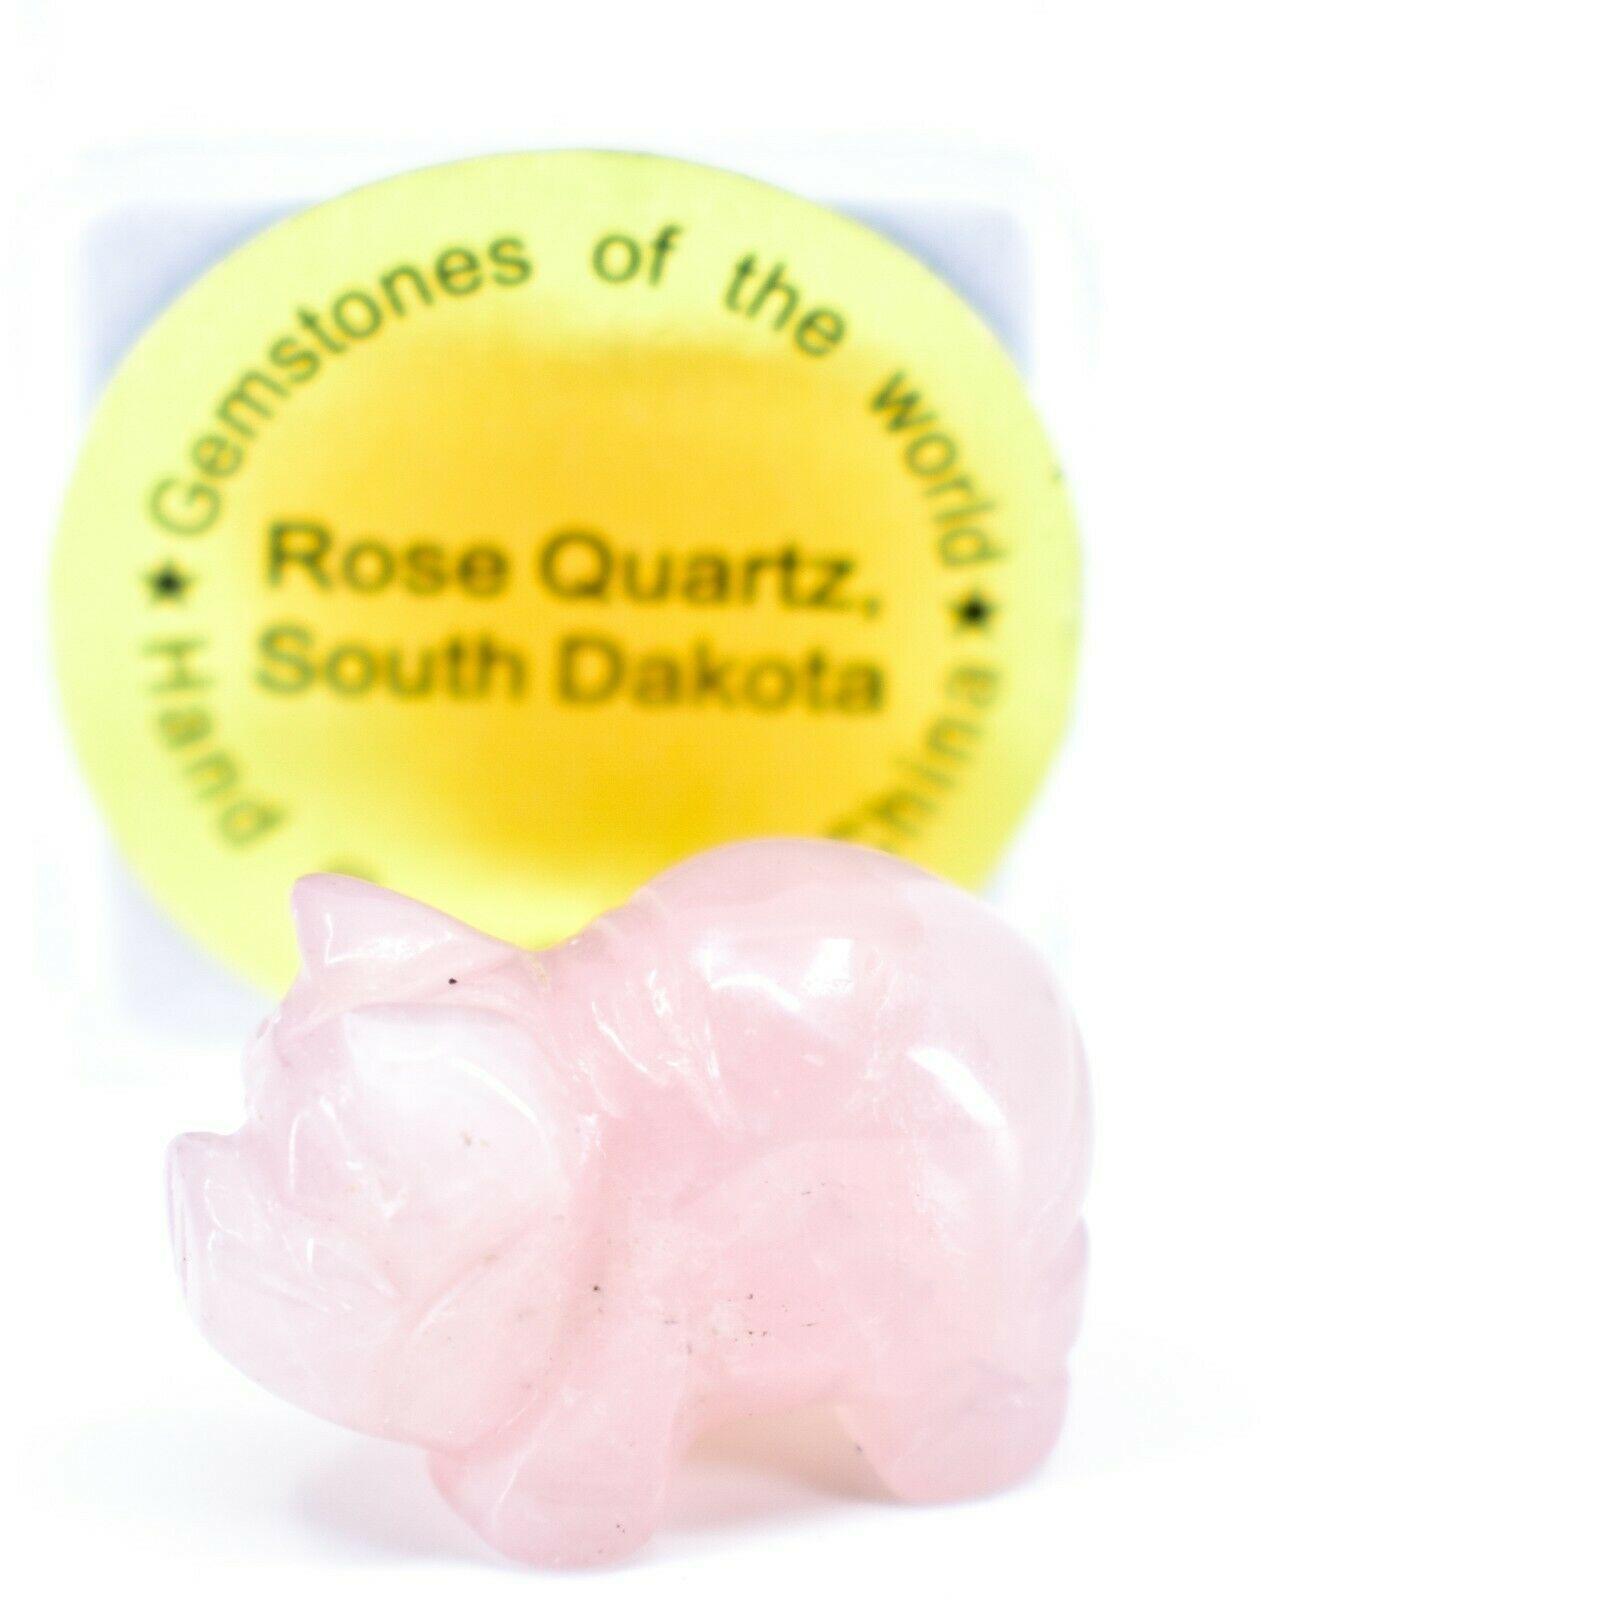 Rose Quartz Gemstone Tiny Miniature Pig Figurine Hand Carved in China